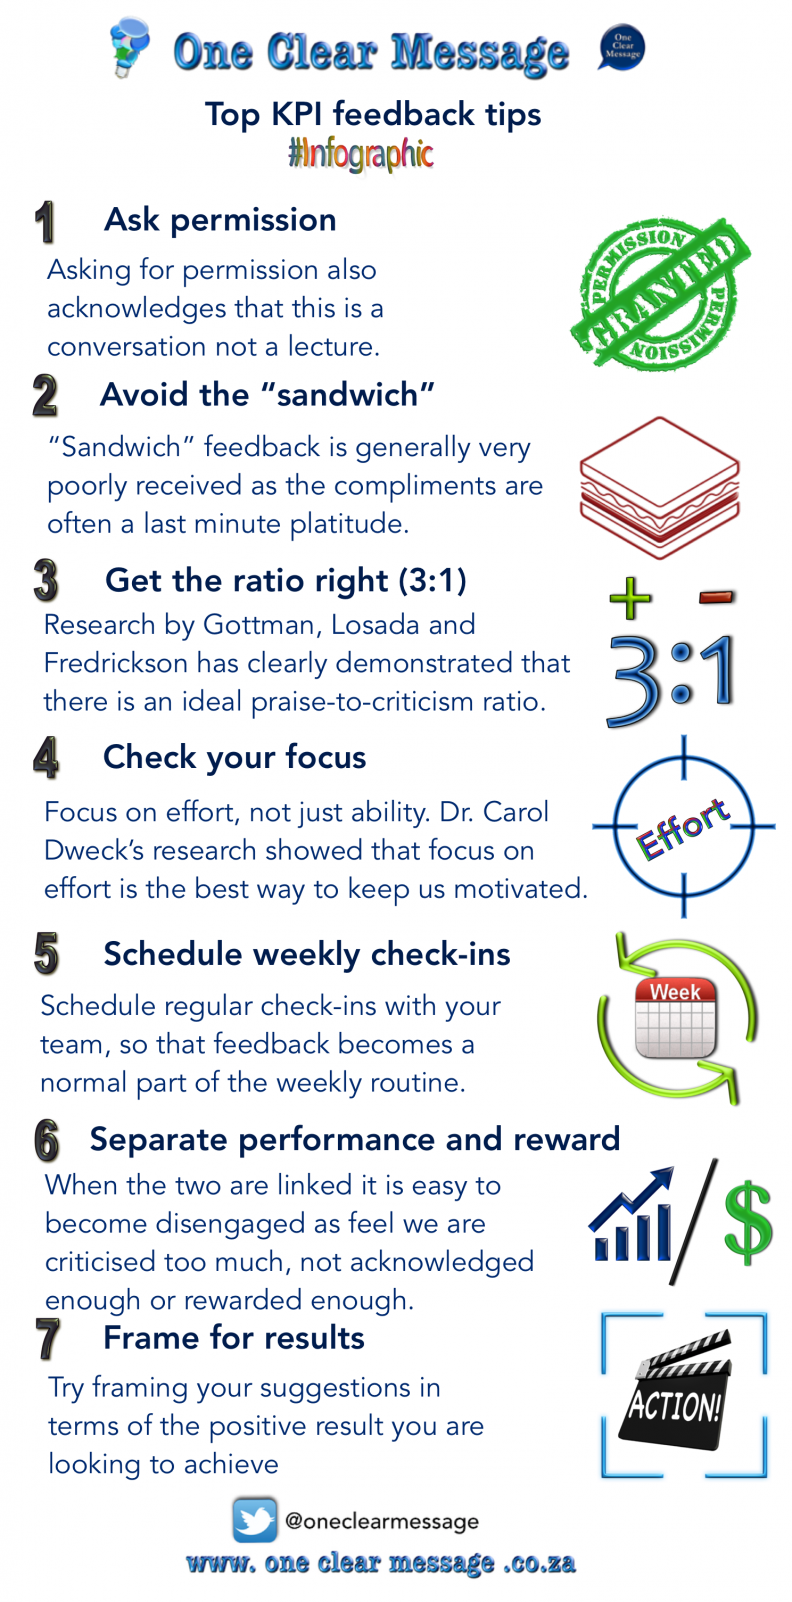 Top KPI feedback tips infographic